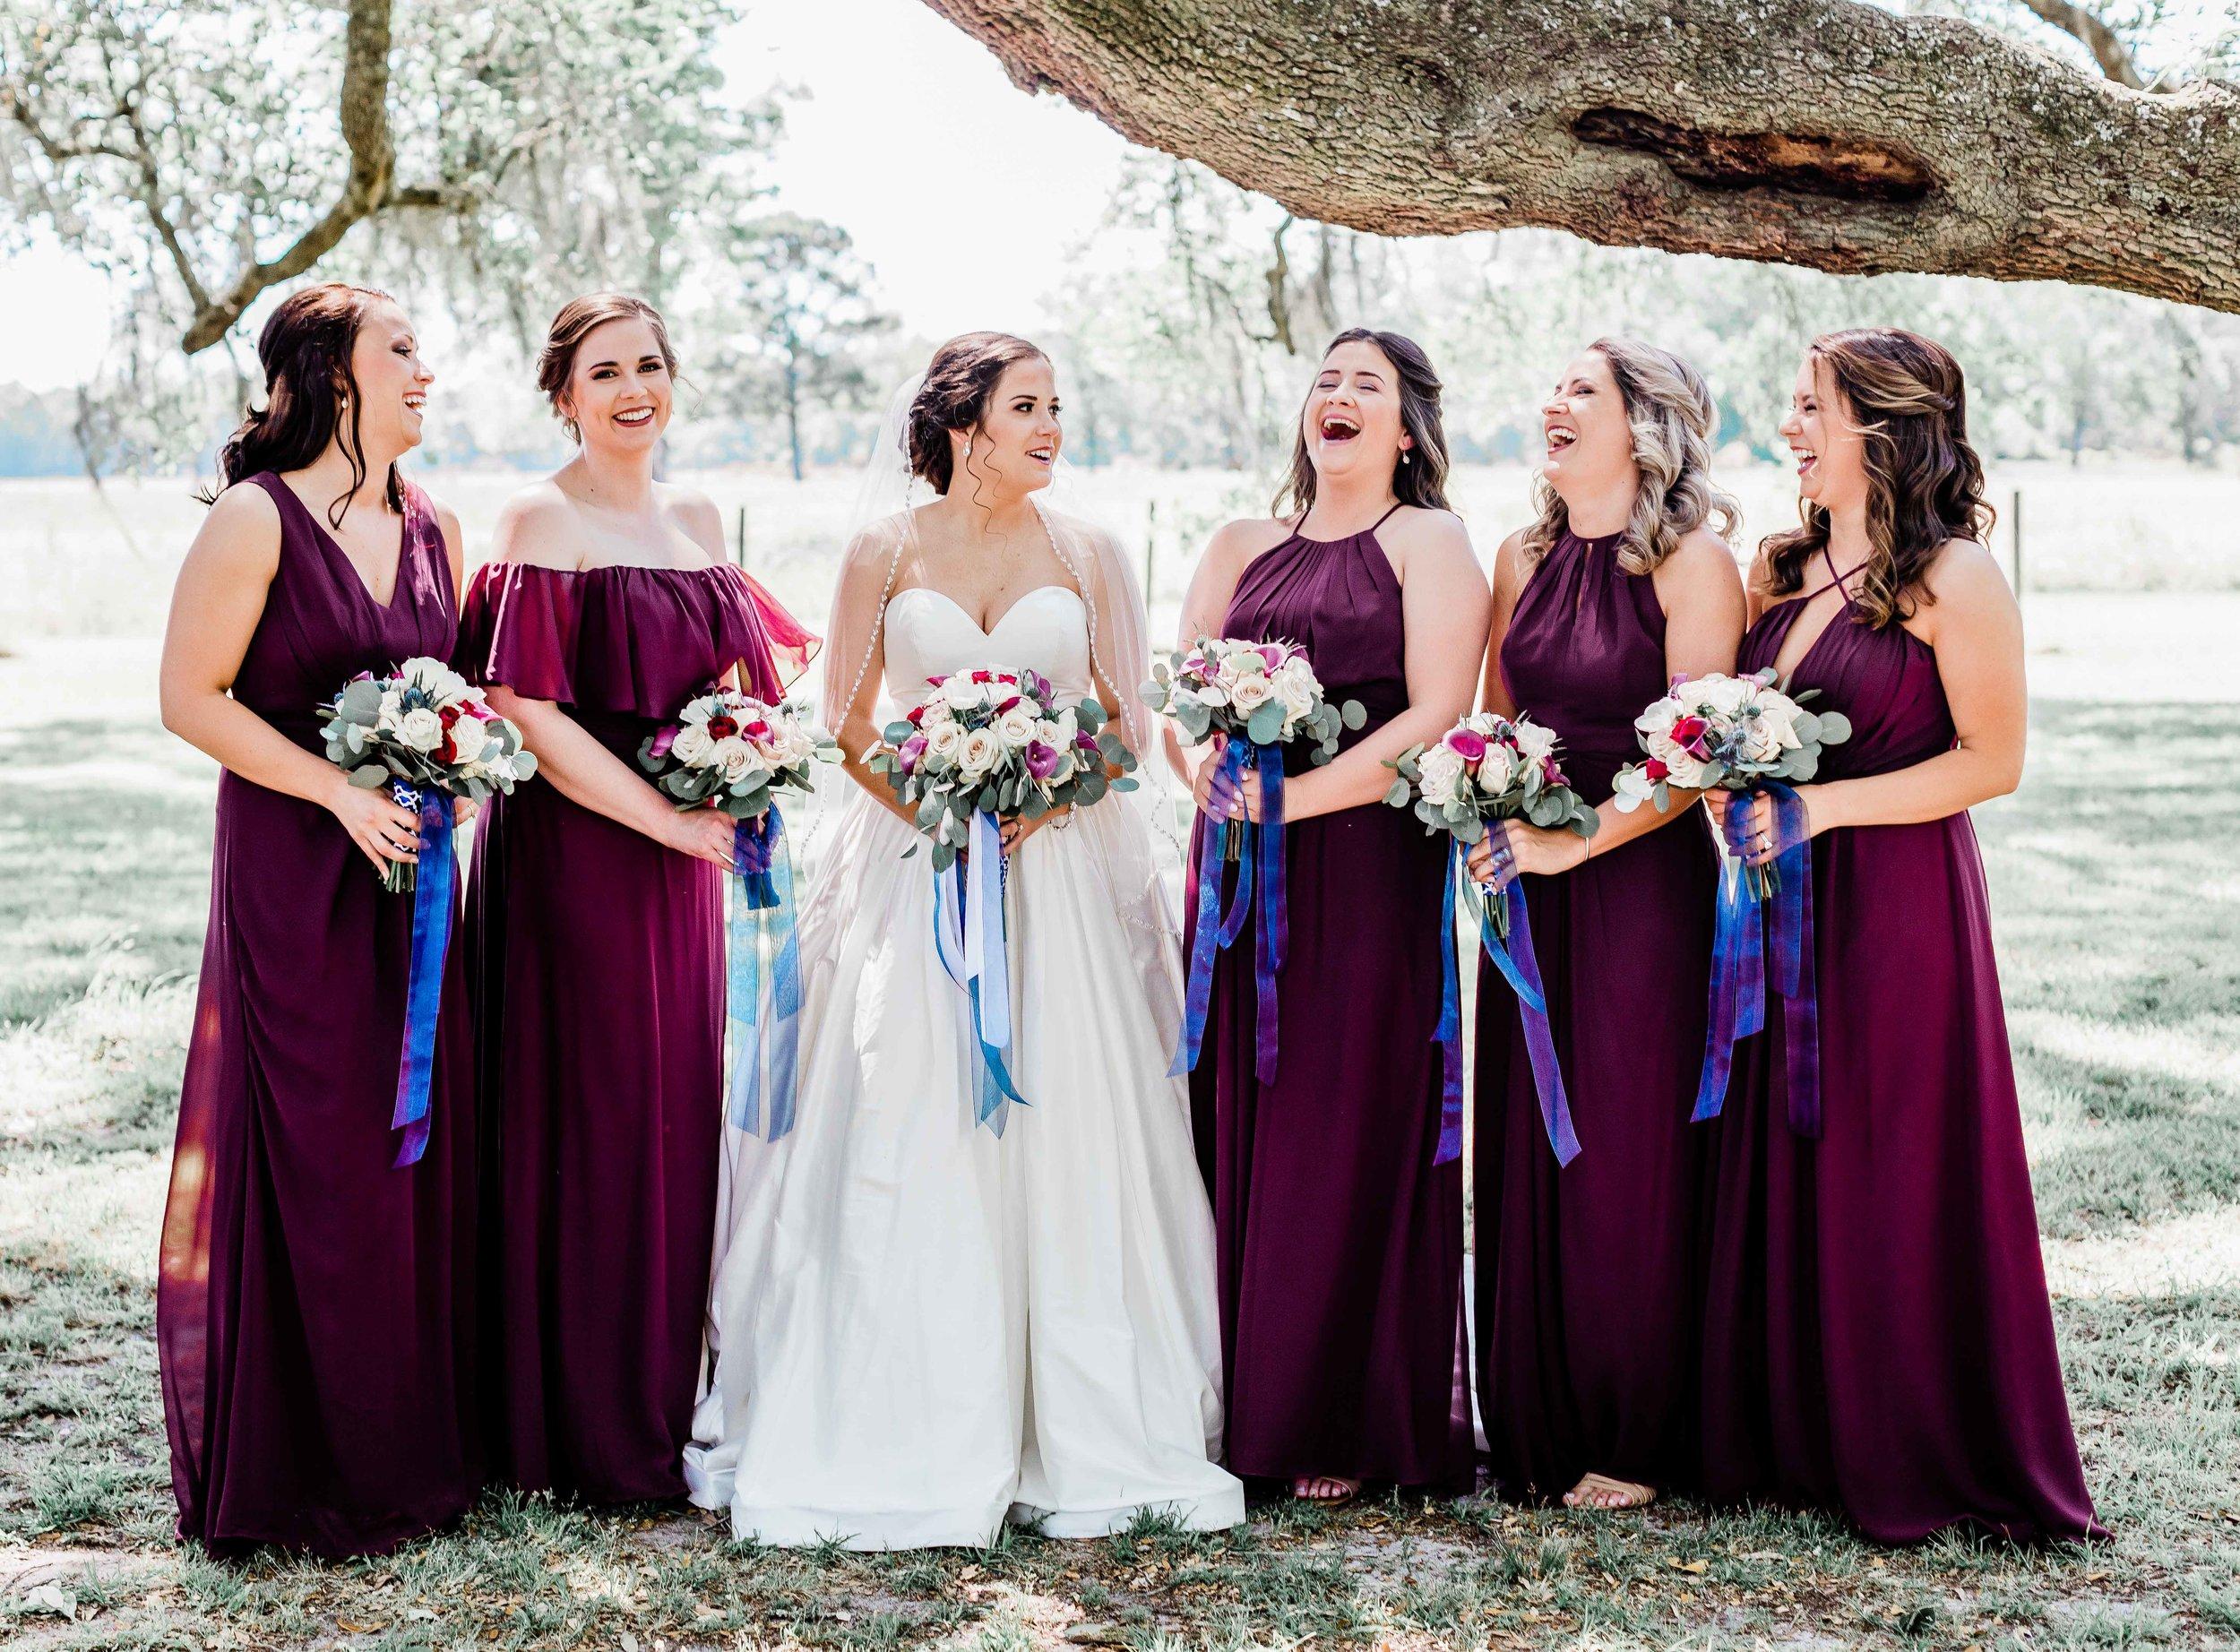 20190427-Southern Lens Photography- Savannah Wedding Photographer-Screven and Caroline-201954.jpg